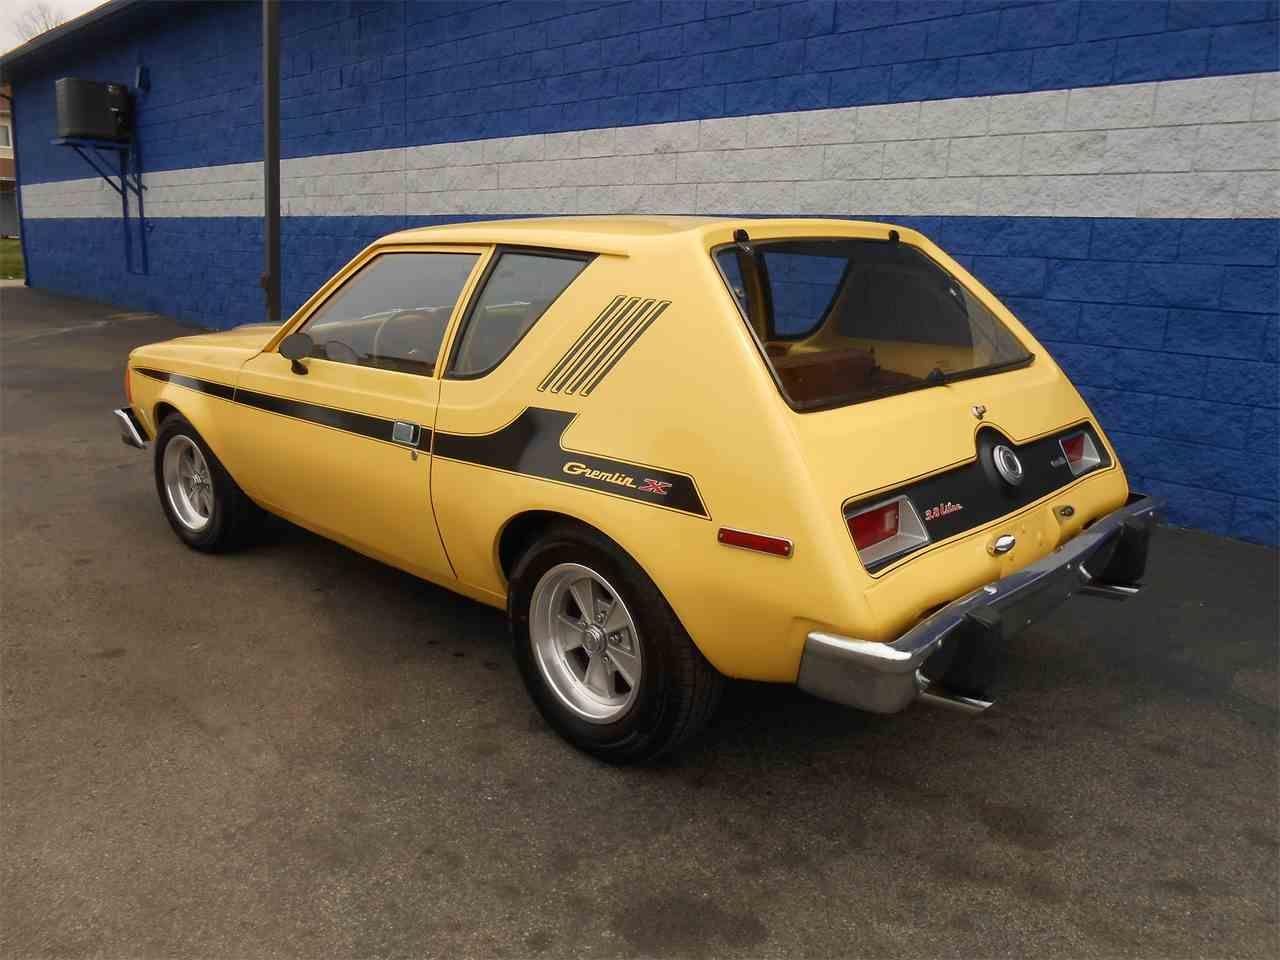 304/Auto Gremlin X | AMC! | Amc gremlin, Gremlins, American